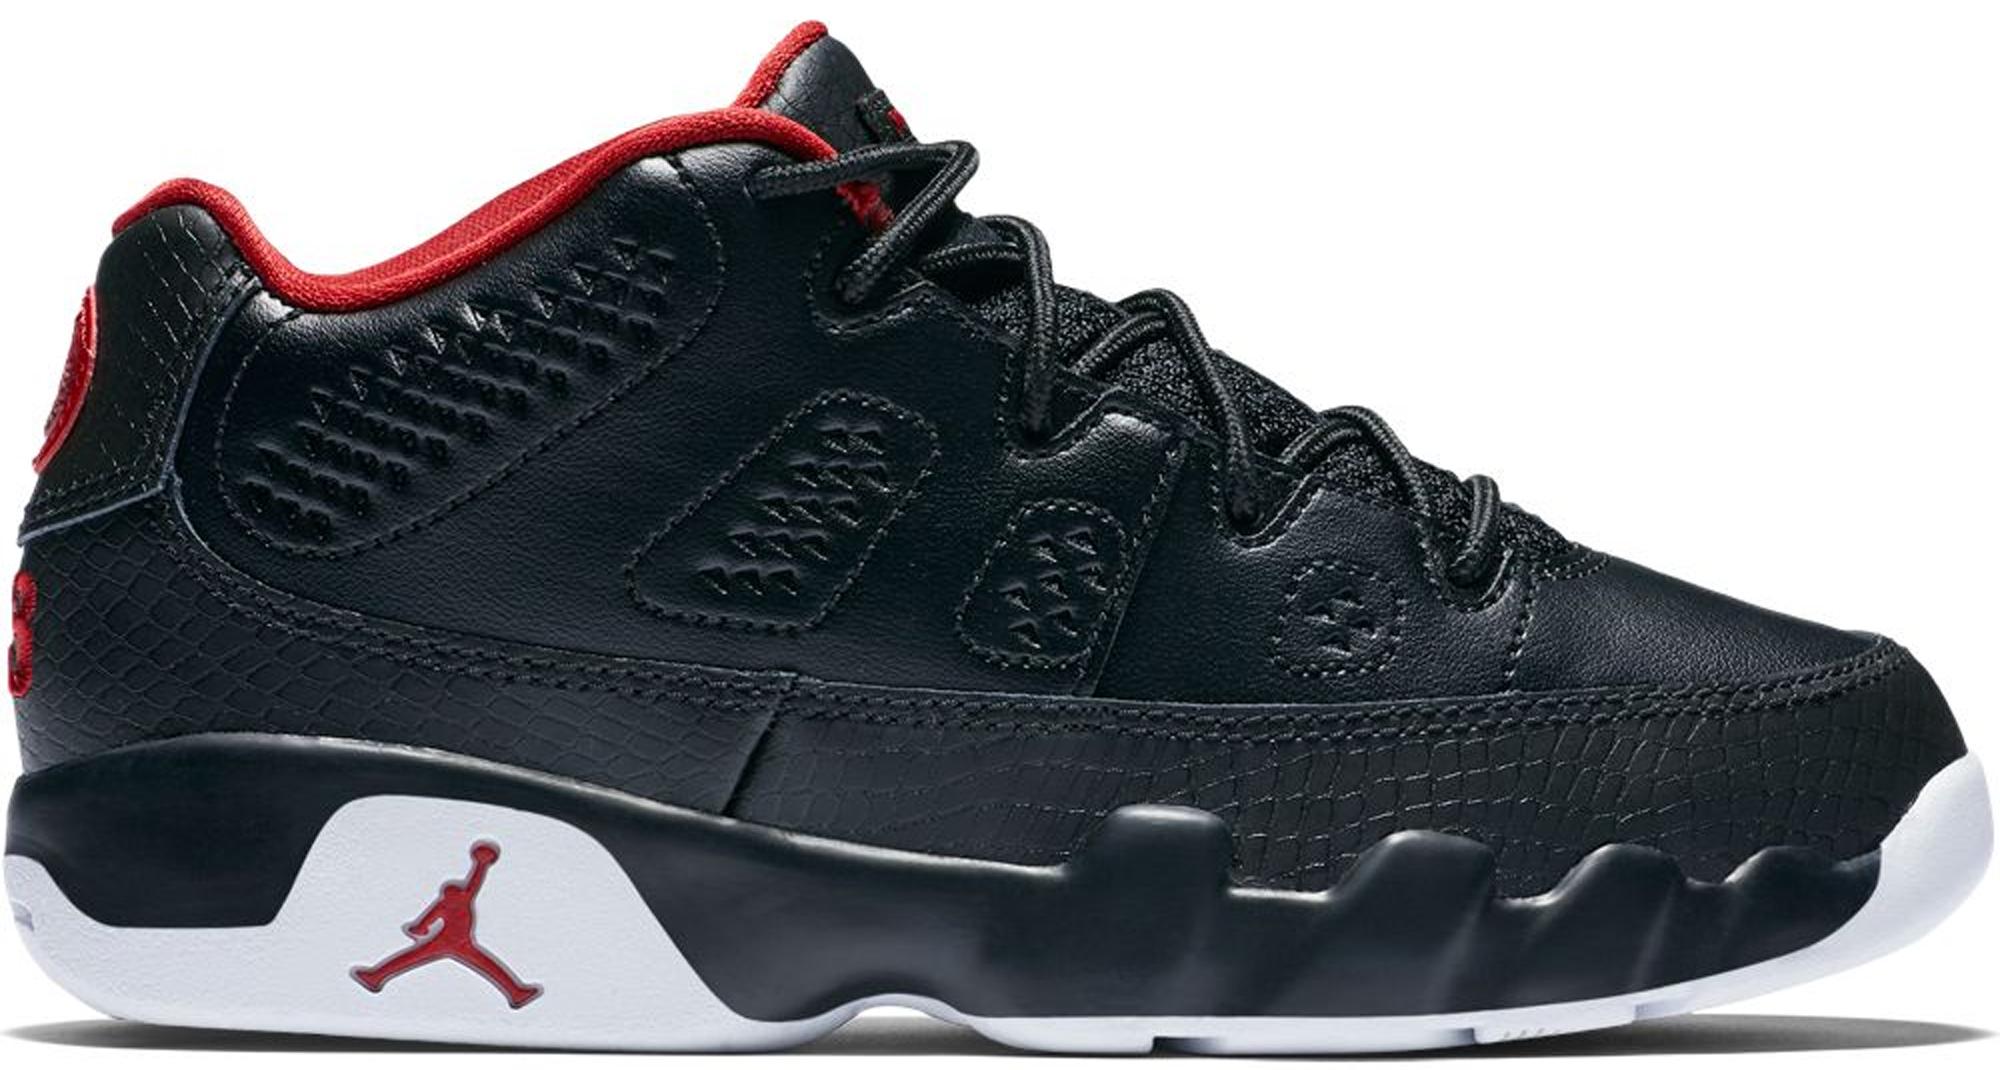 Jordan 9 Retro Low Snakeskin (PS)